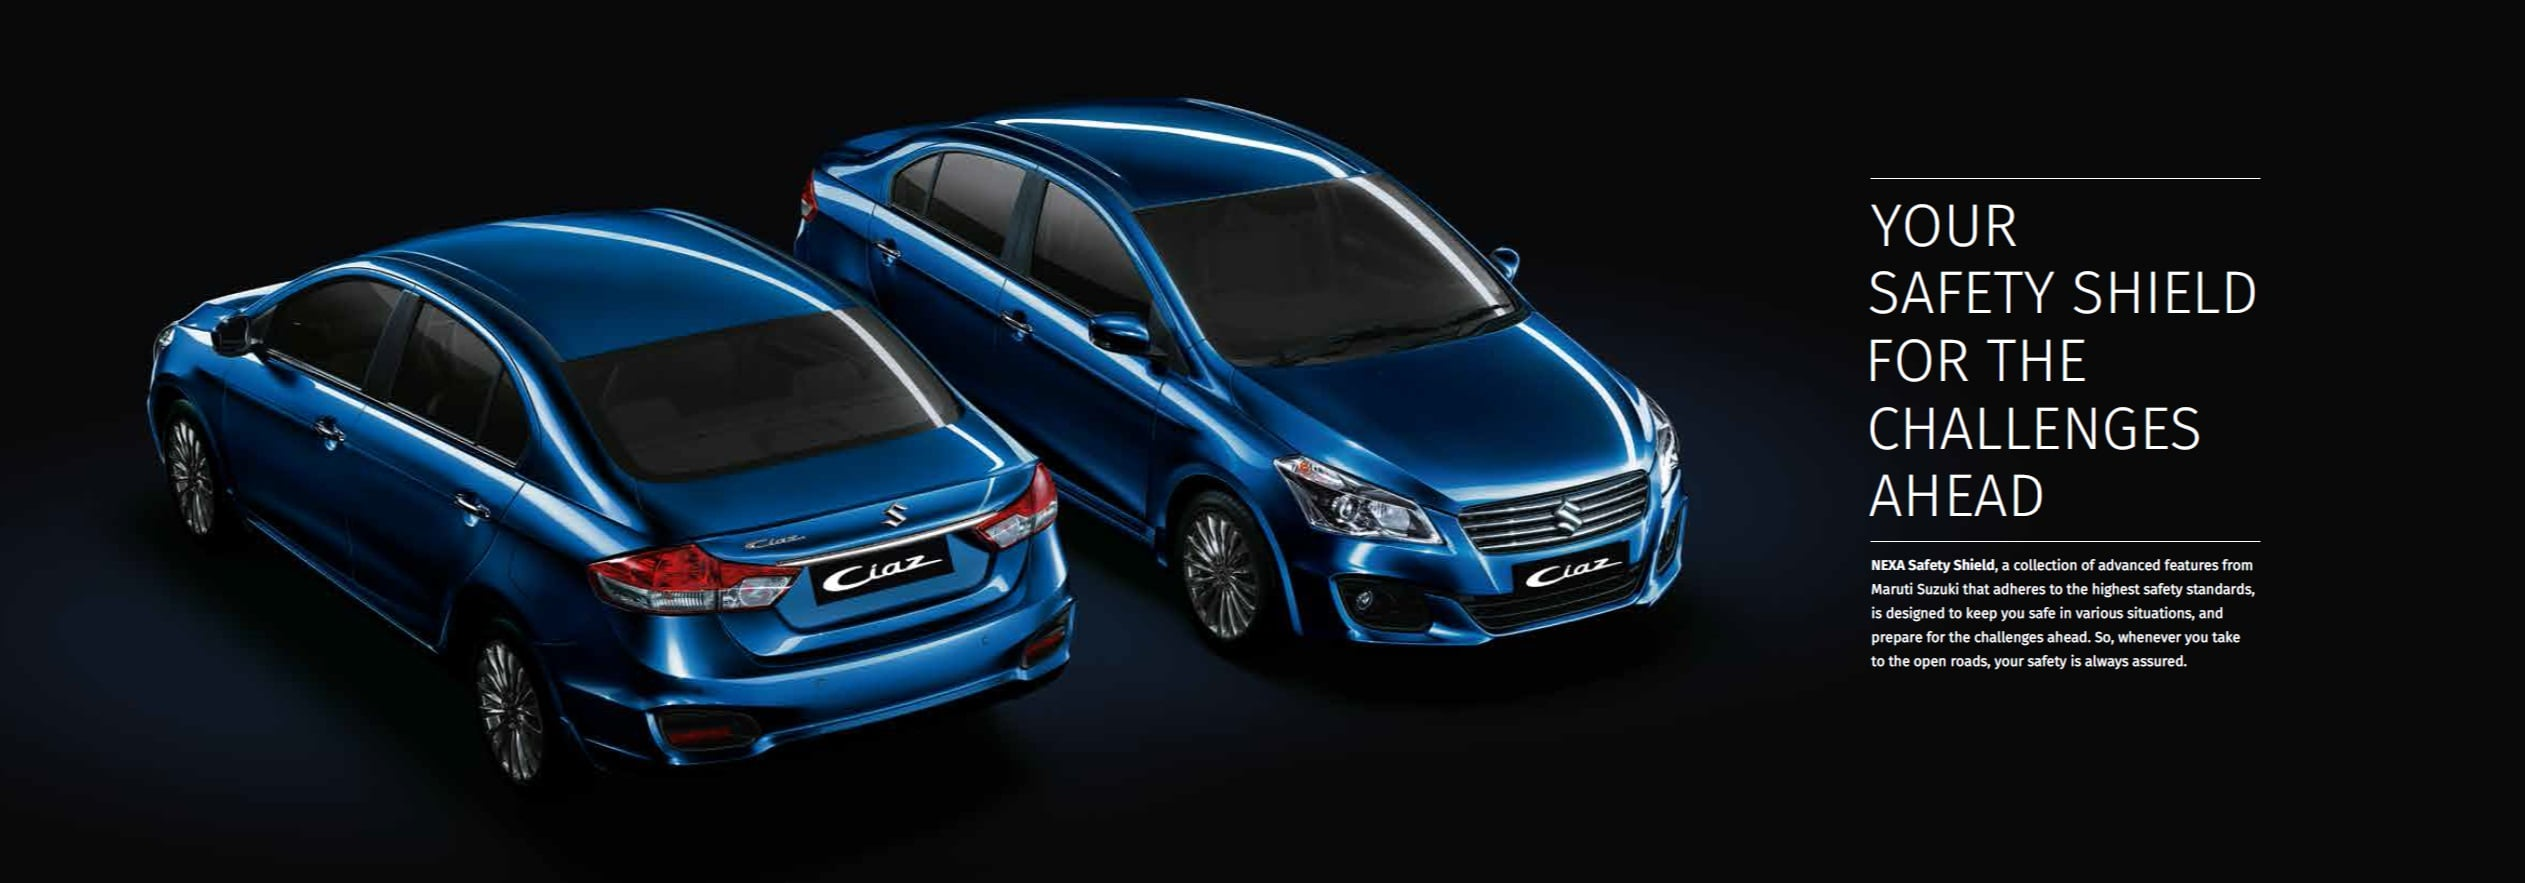 2017 Maruti Suzuki Ciaz Nexa Price Specifications Features Mileage